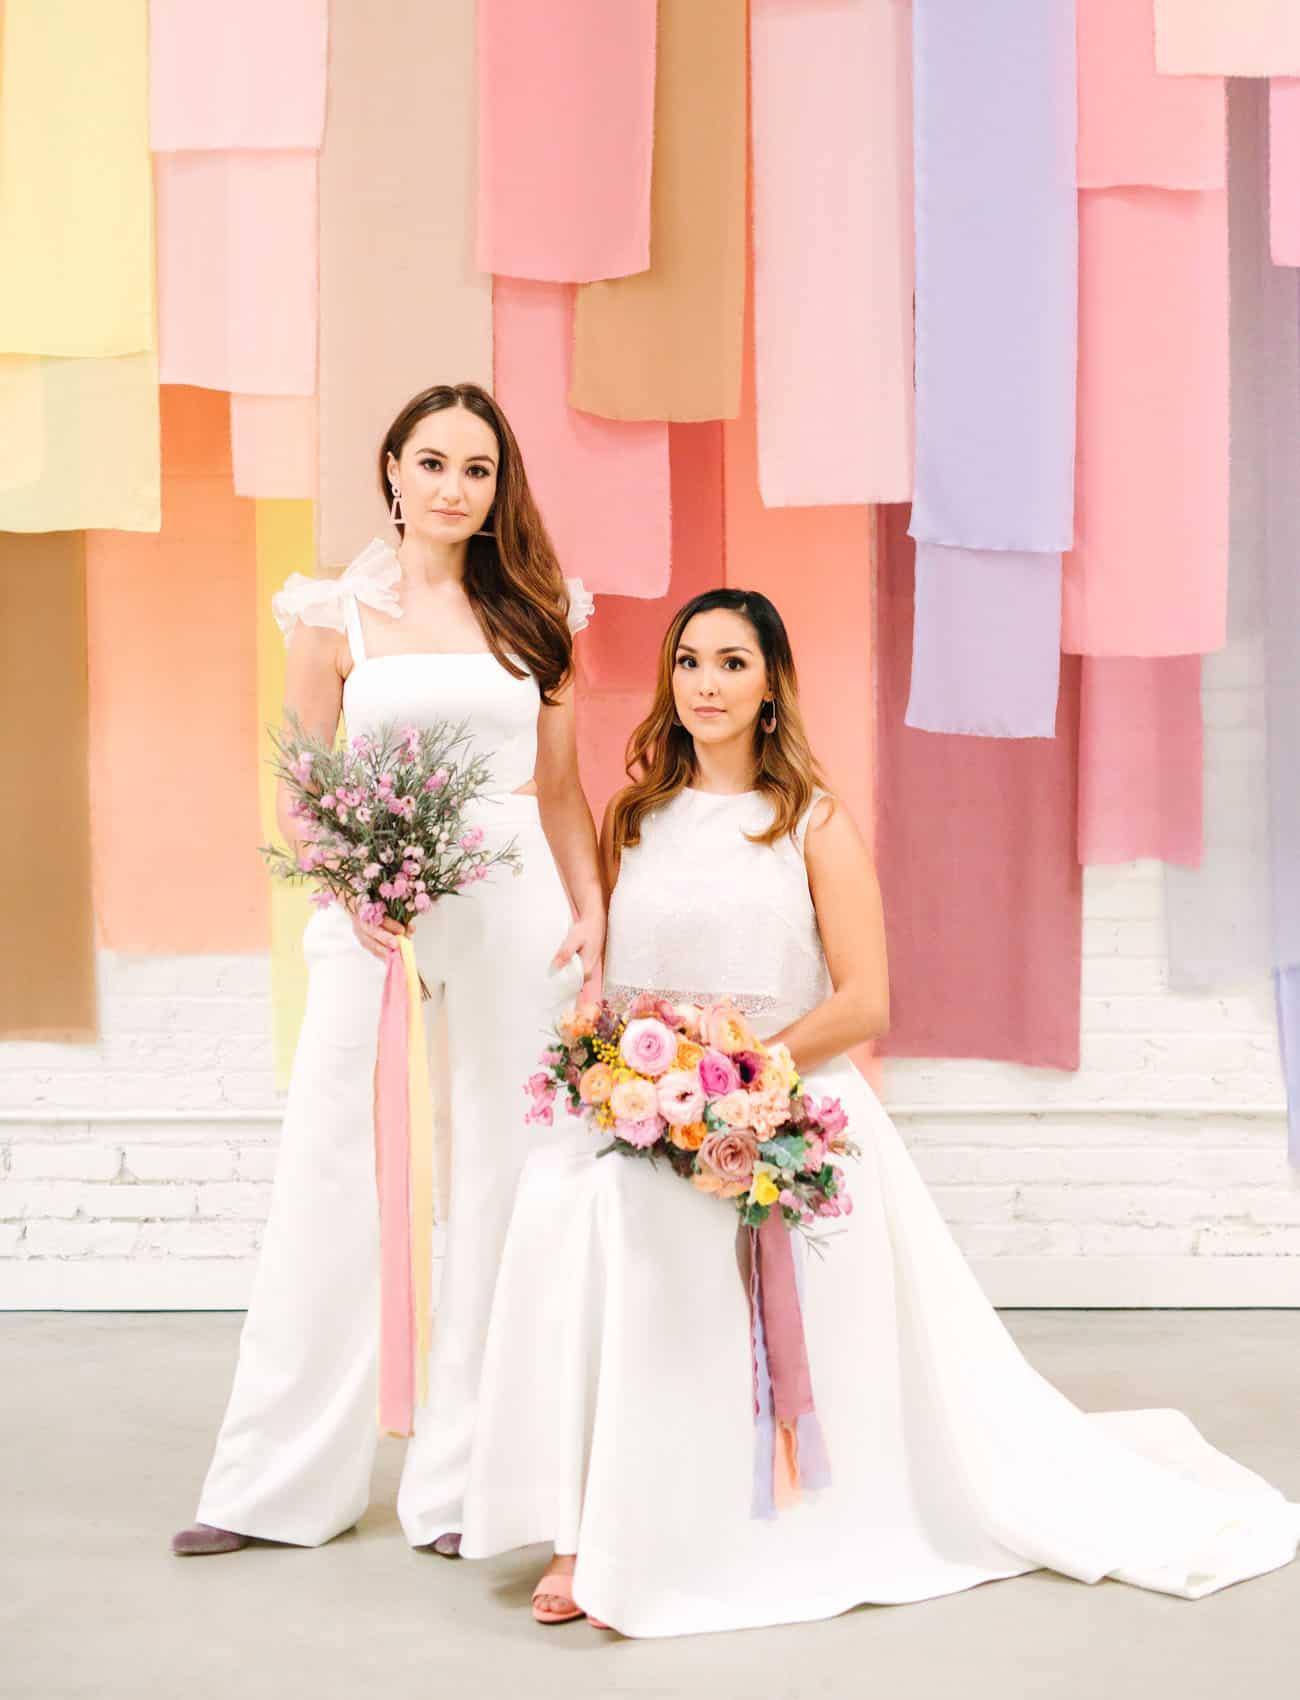 unique & modern wedding backdrop idea with pastel color theme